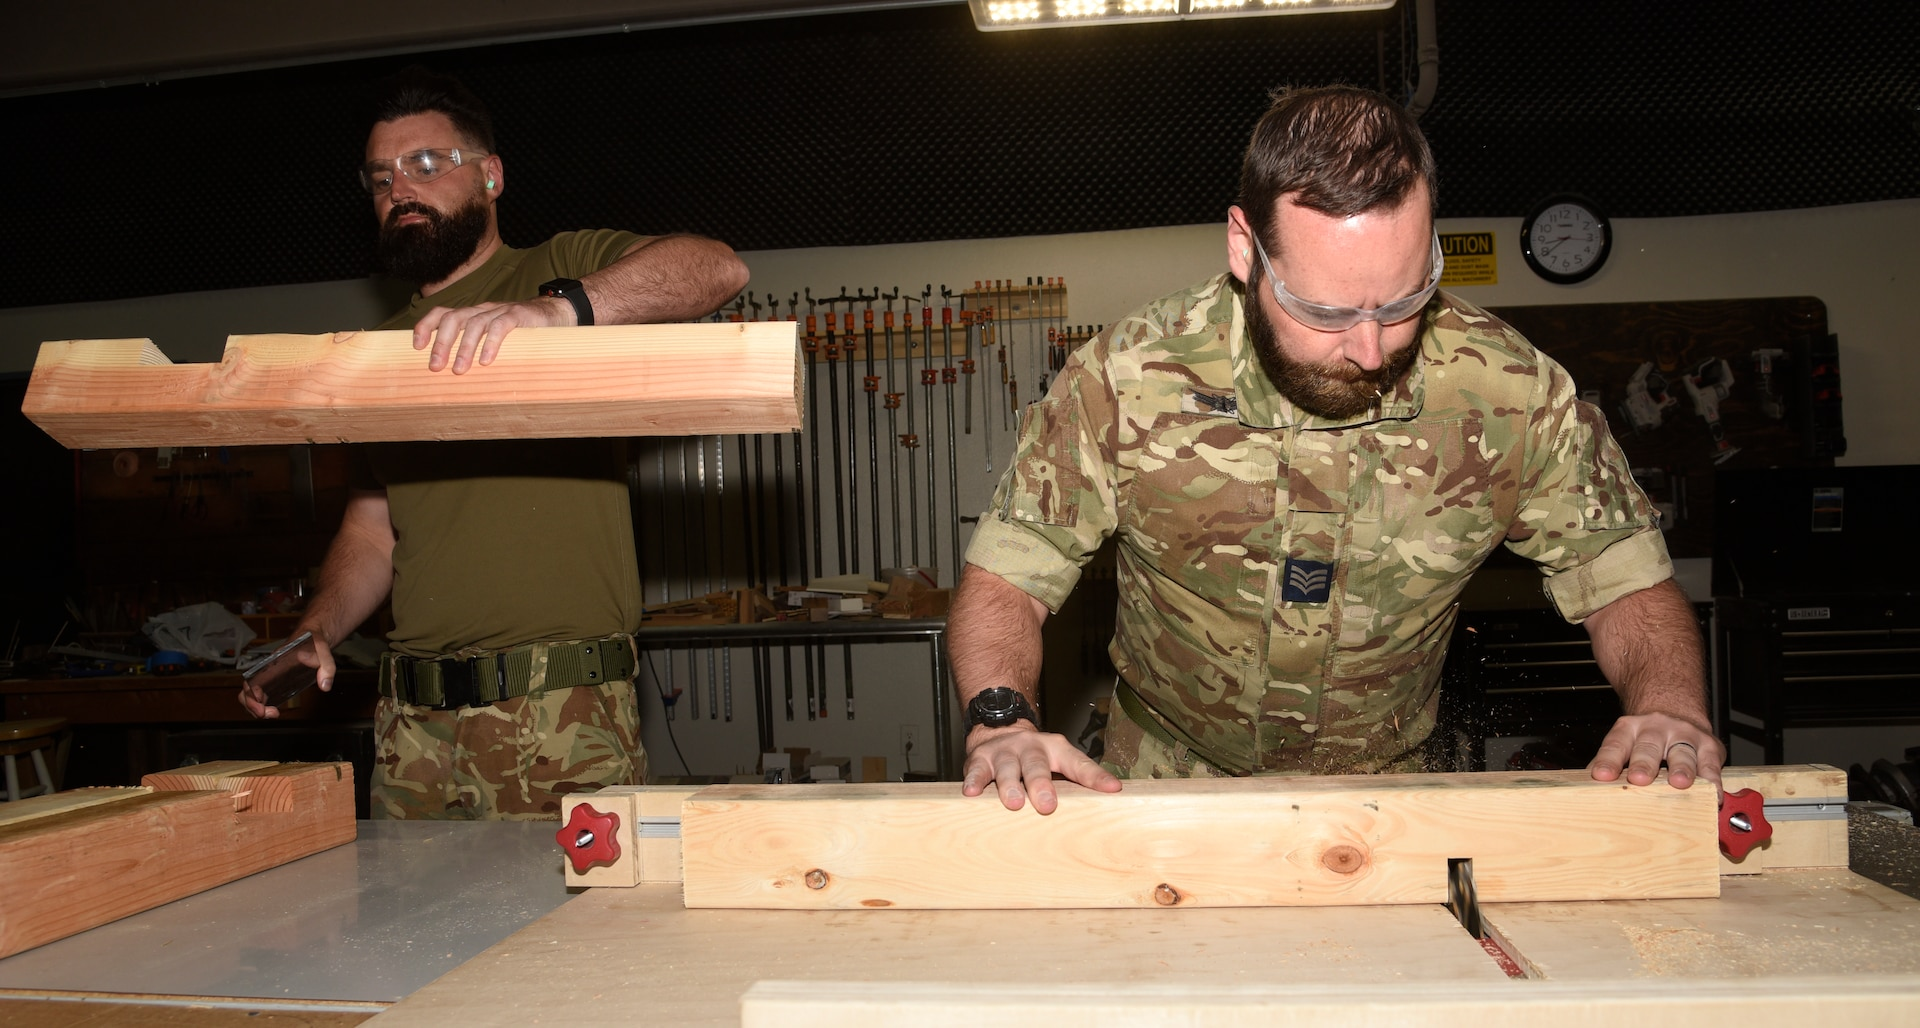 United Kingdom Royal Air Force prepare pieces of wood